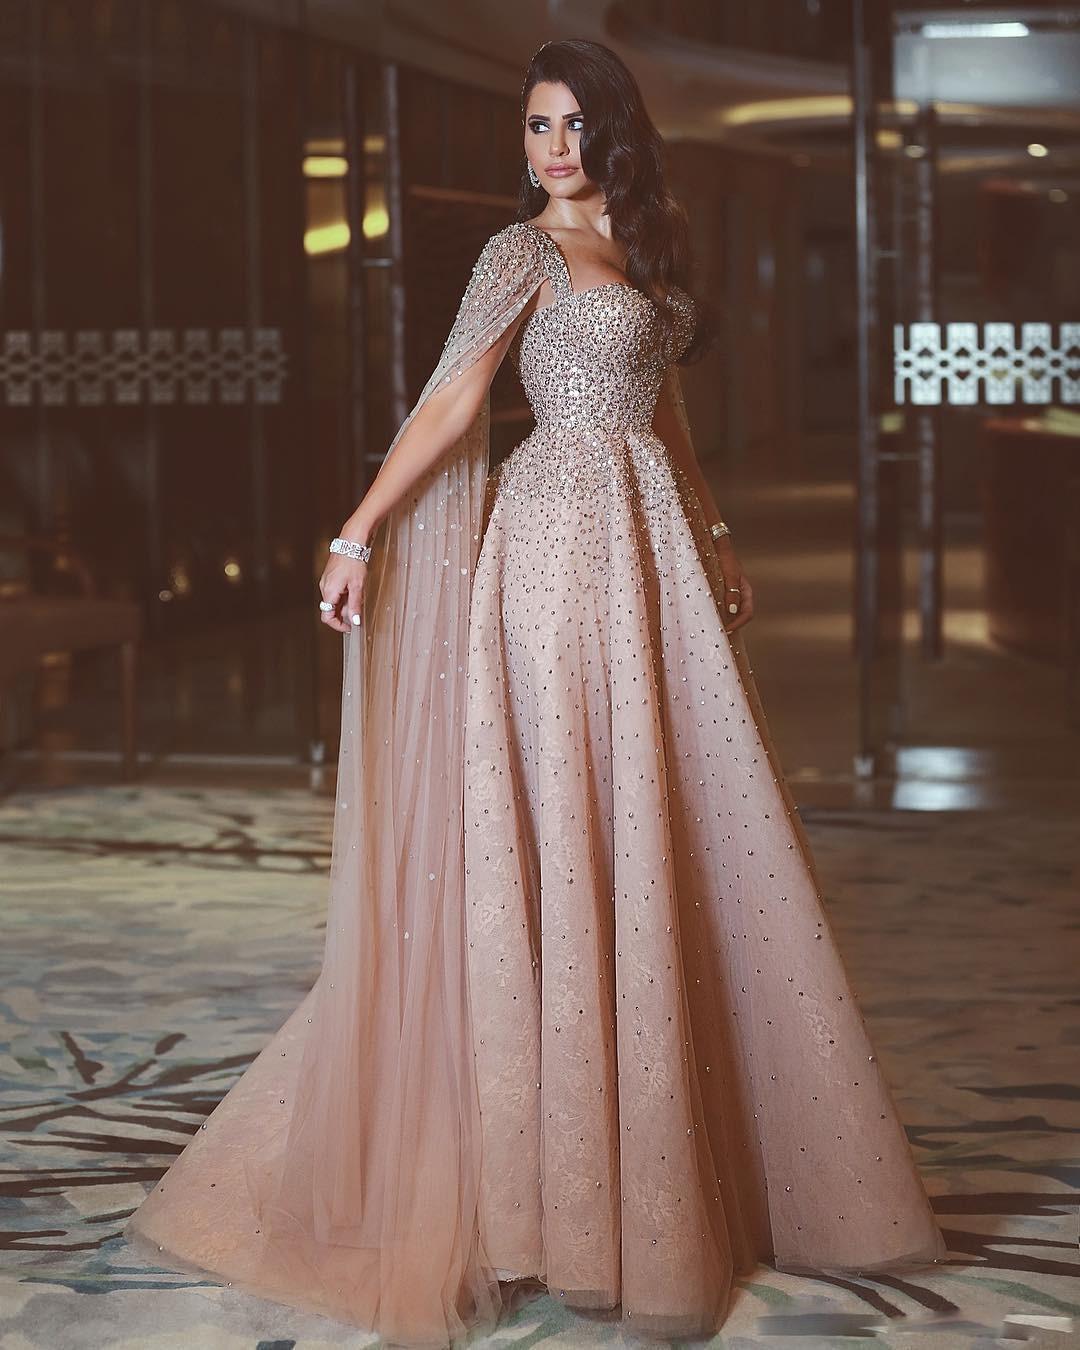 a99a8428a8 Luxury Evening Dresses 2018 Heavy Beaded Pearls Arabic Dubai Nude ...